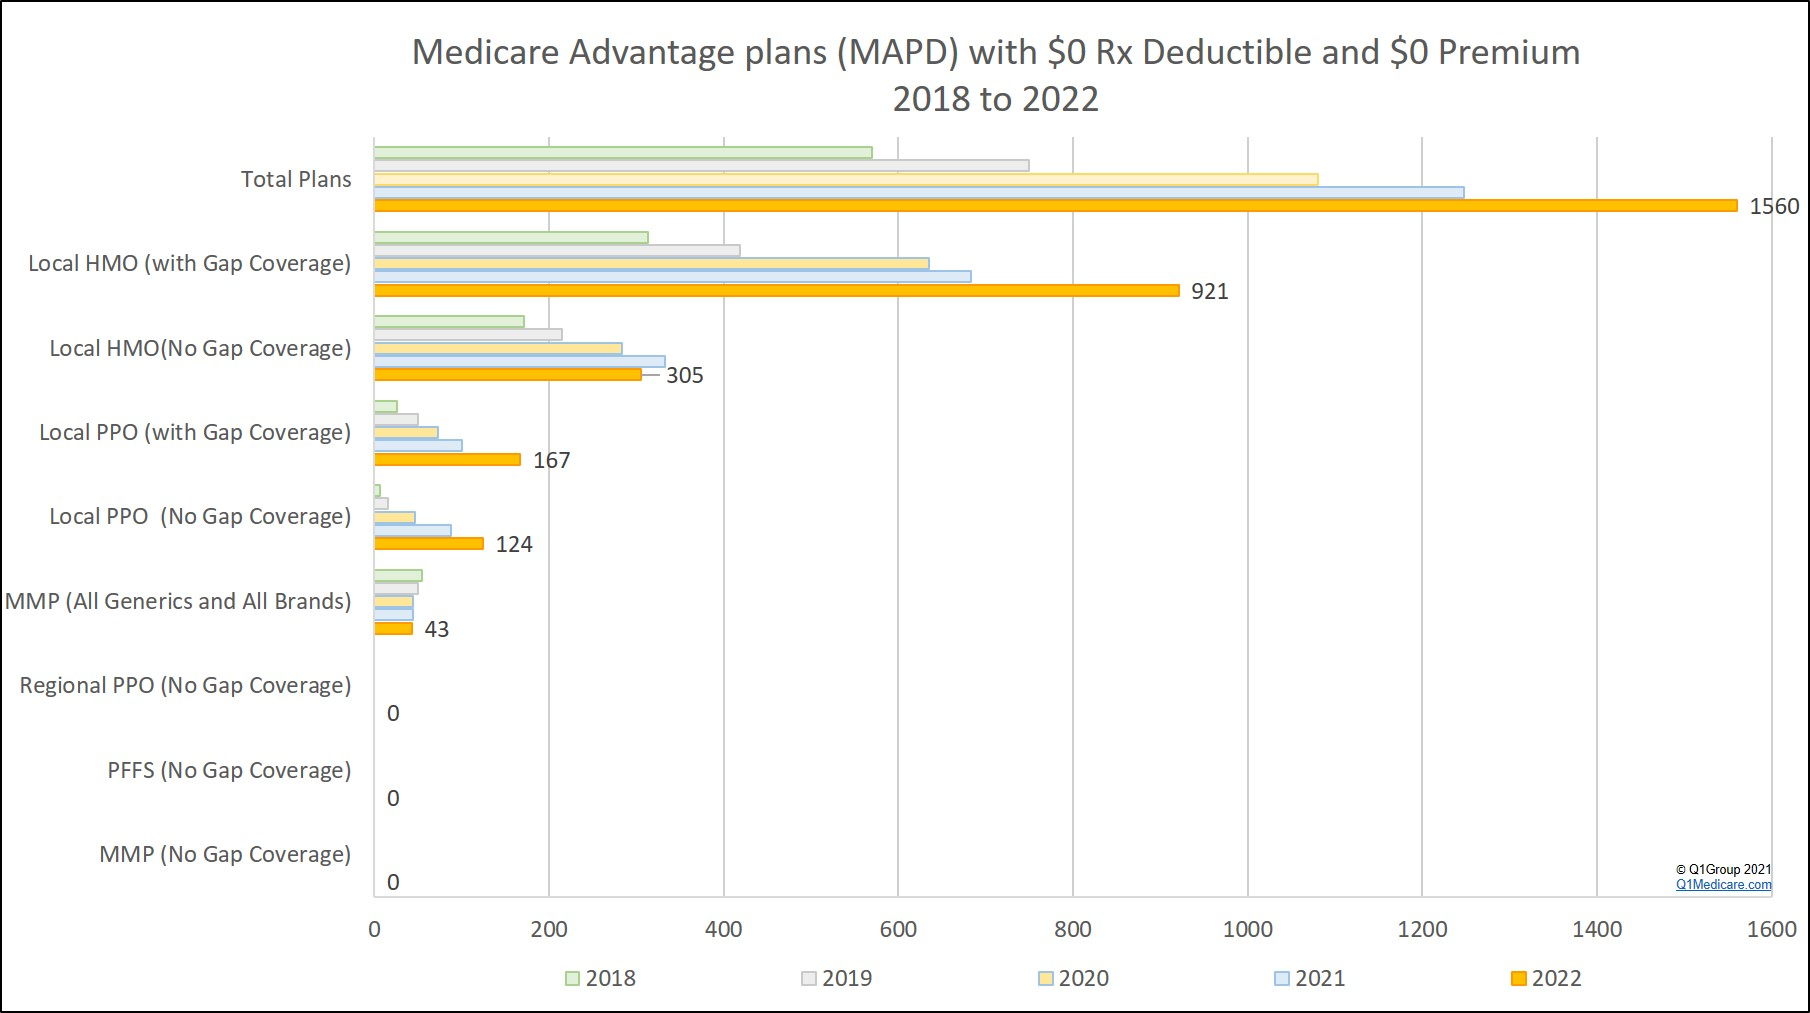 Medicare Advantage MAPD plans with a zero premium and zero drug deductible